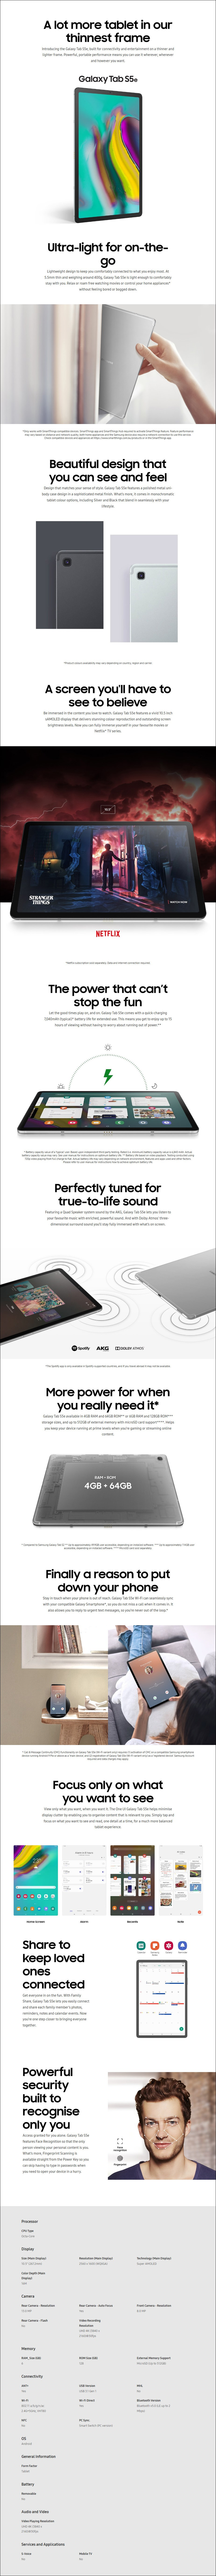 "Samsung Galaxy Tab S5e 10.5"" AMOLED 128GB Wi-Fi 4G - Silver - Desktop Overview 1"